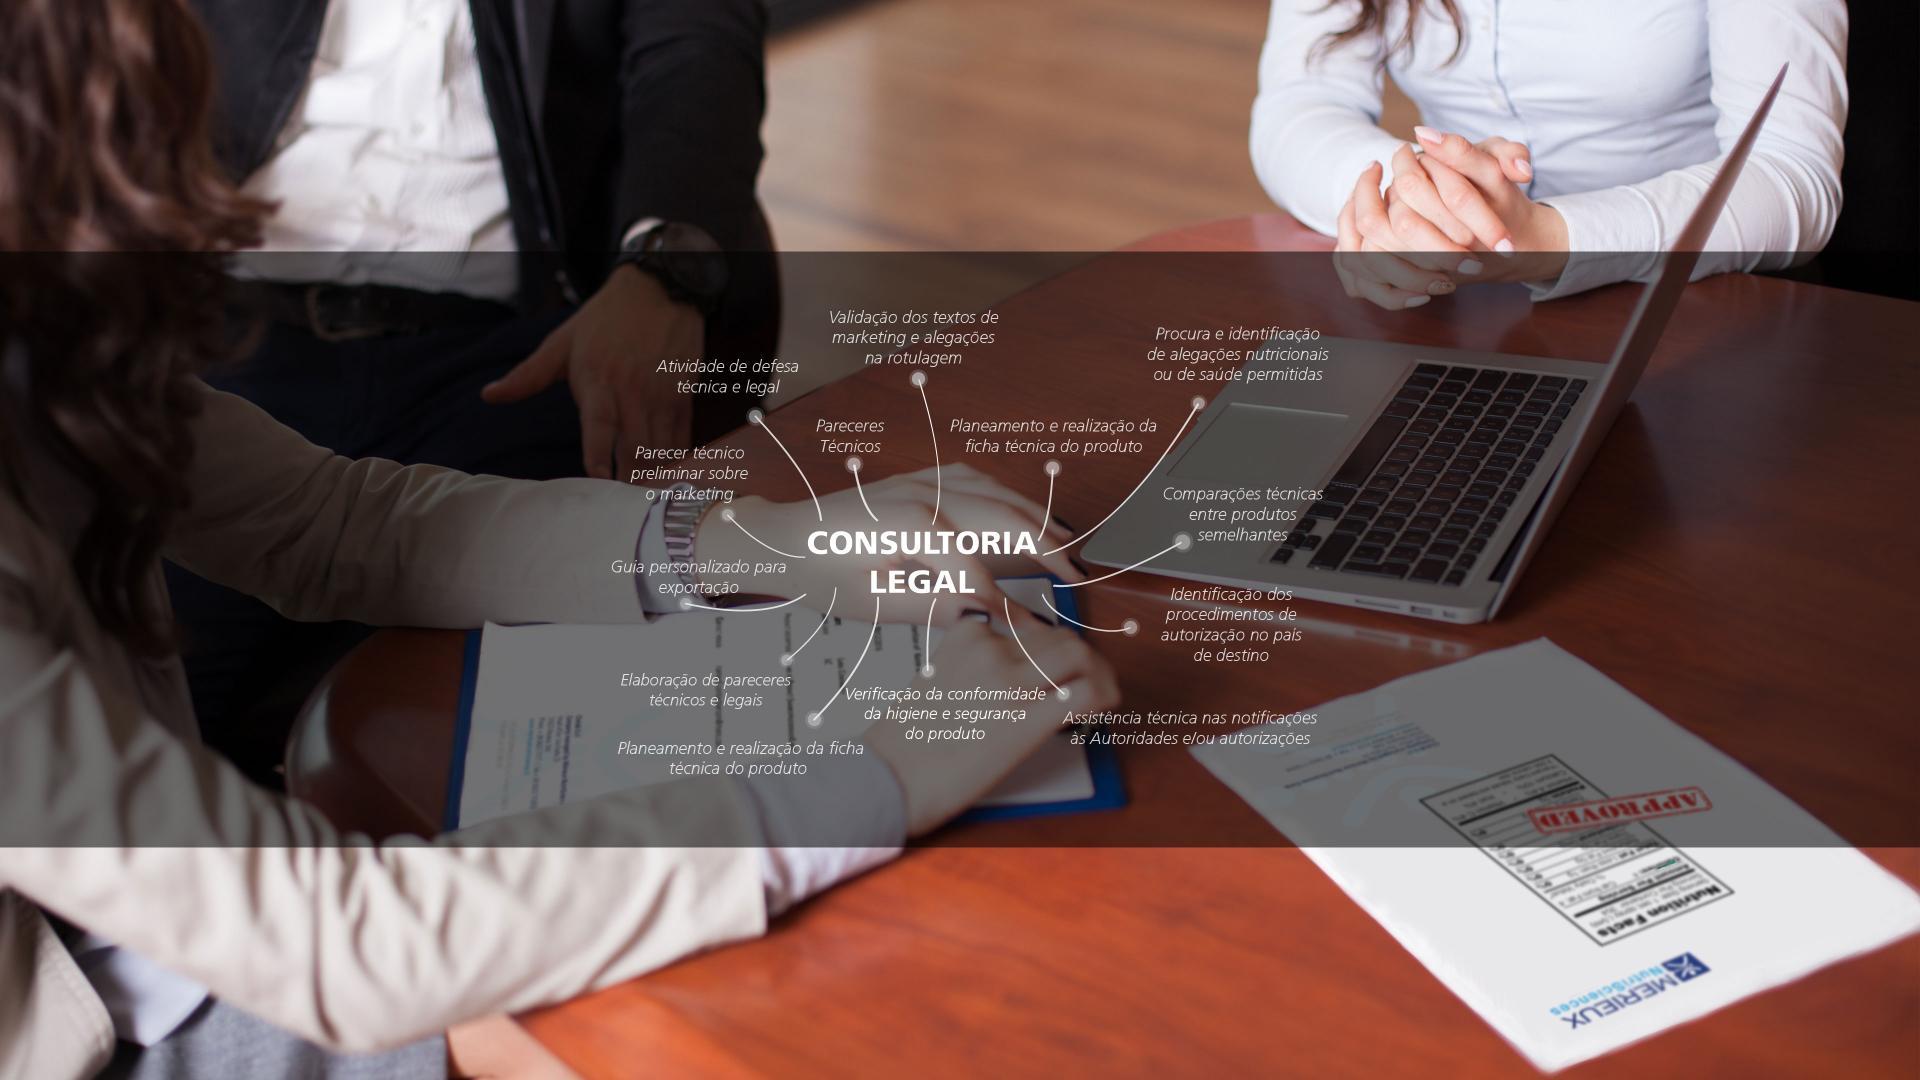 Mérieux NutriSciences - Labeling and regulatory - CONSULTORIA LEGAL  - PT